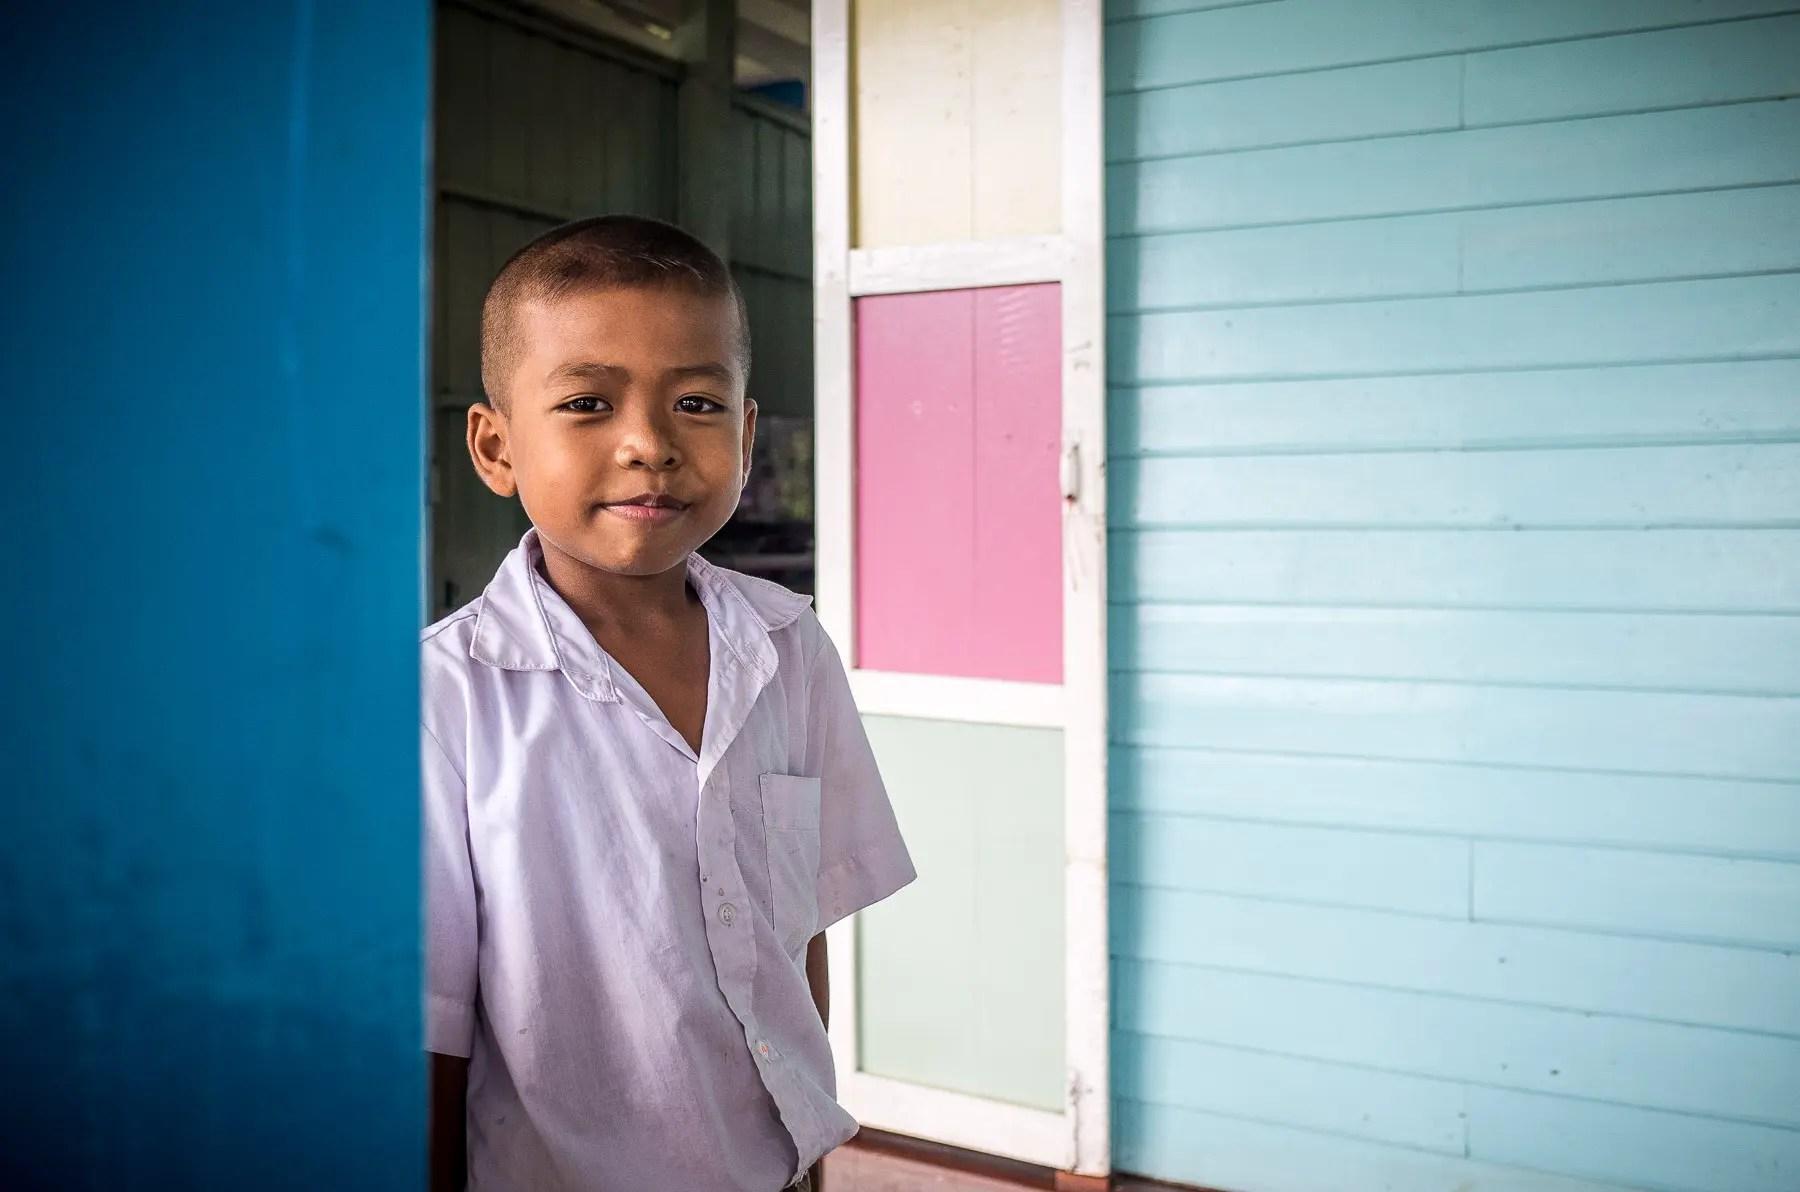 Thai schoolboy